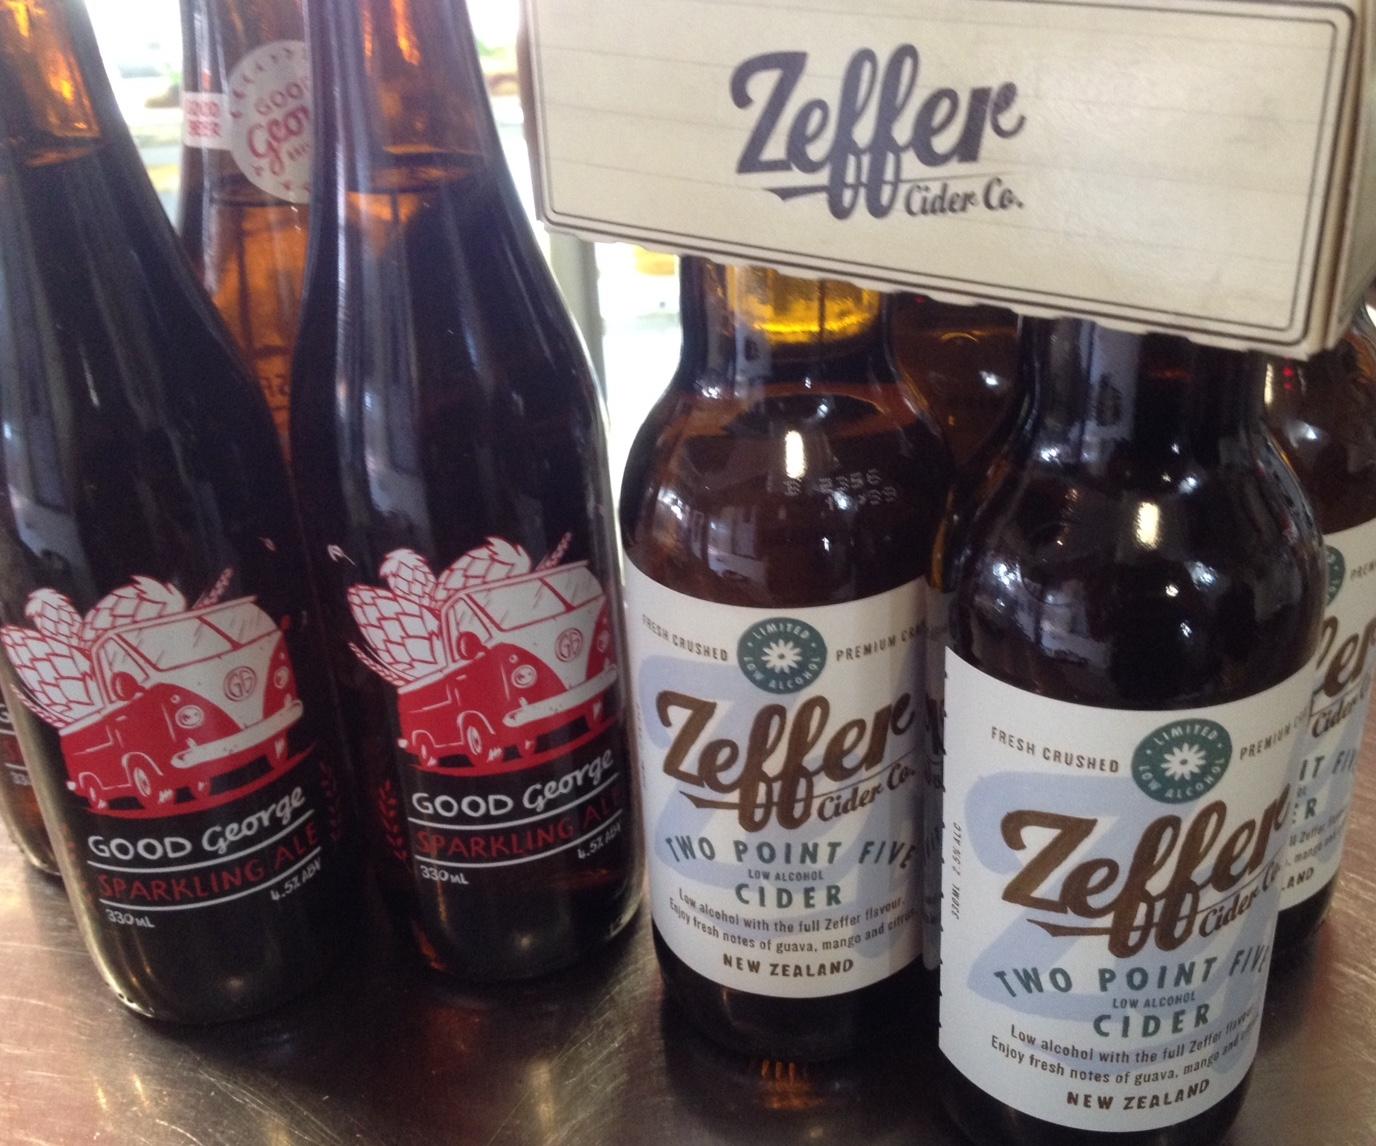 Good George Beer, Zeffer Cider, at Rouge, Cambridge